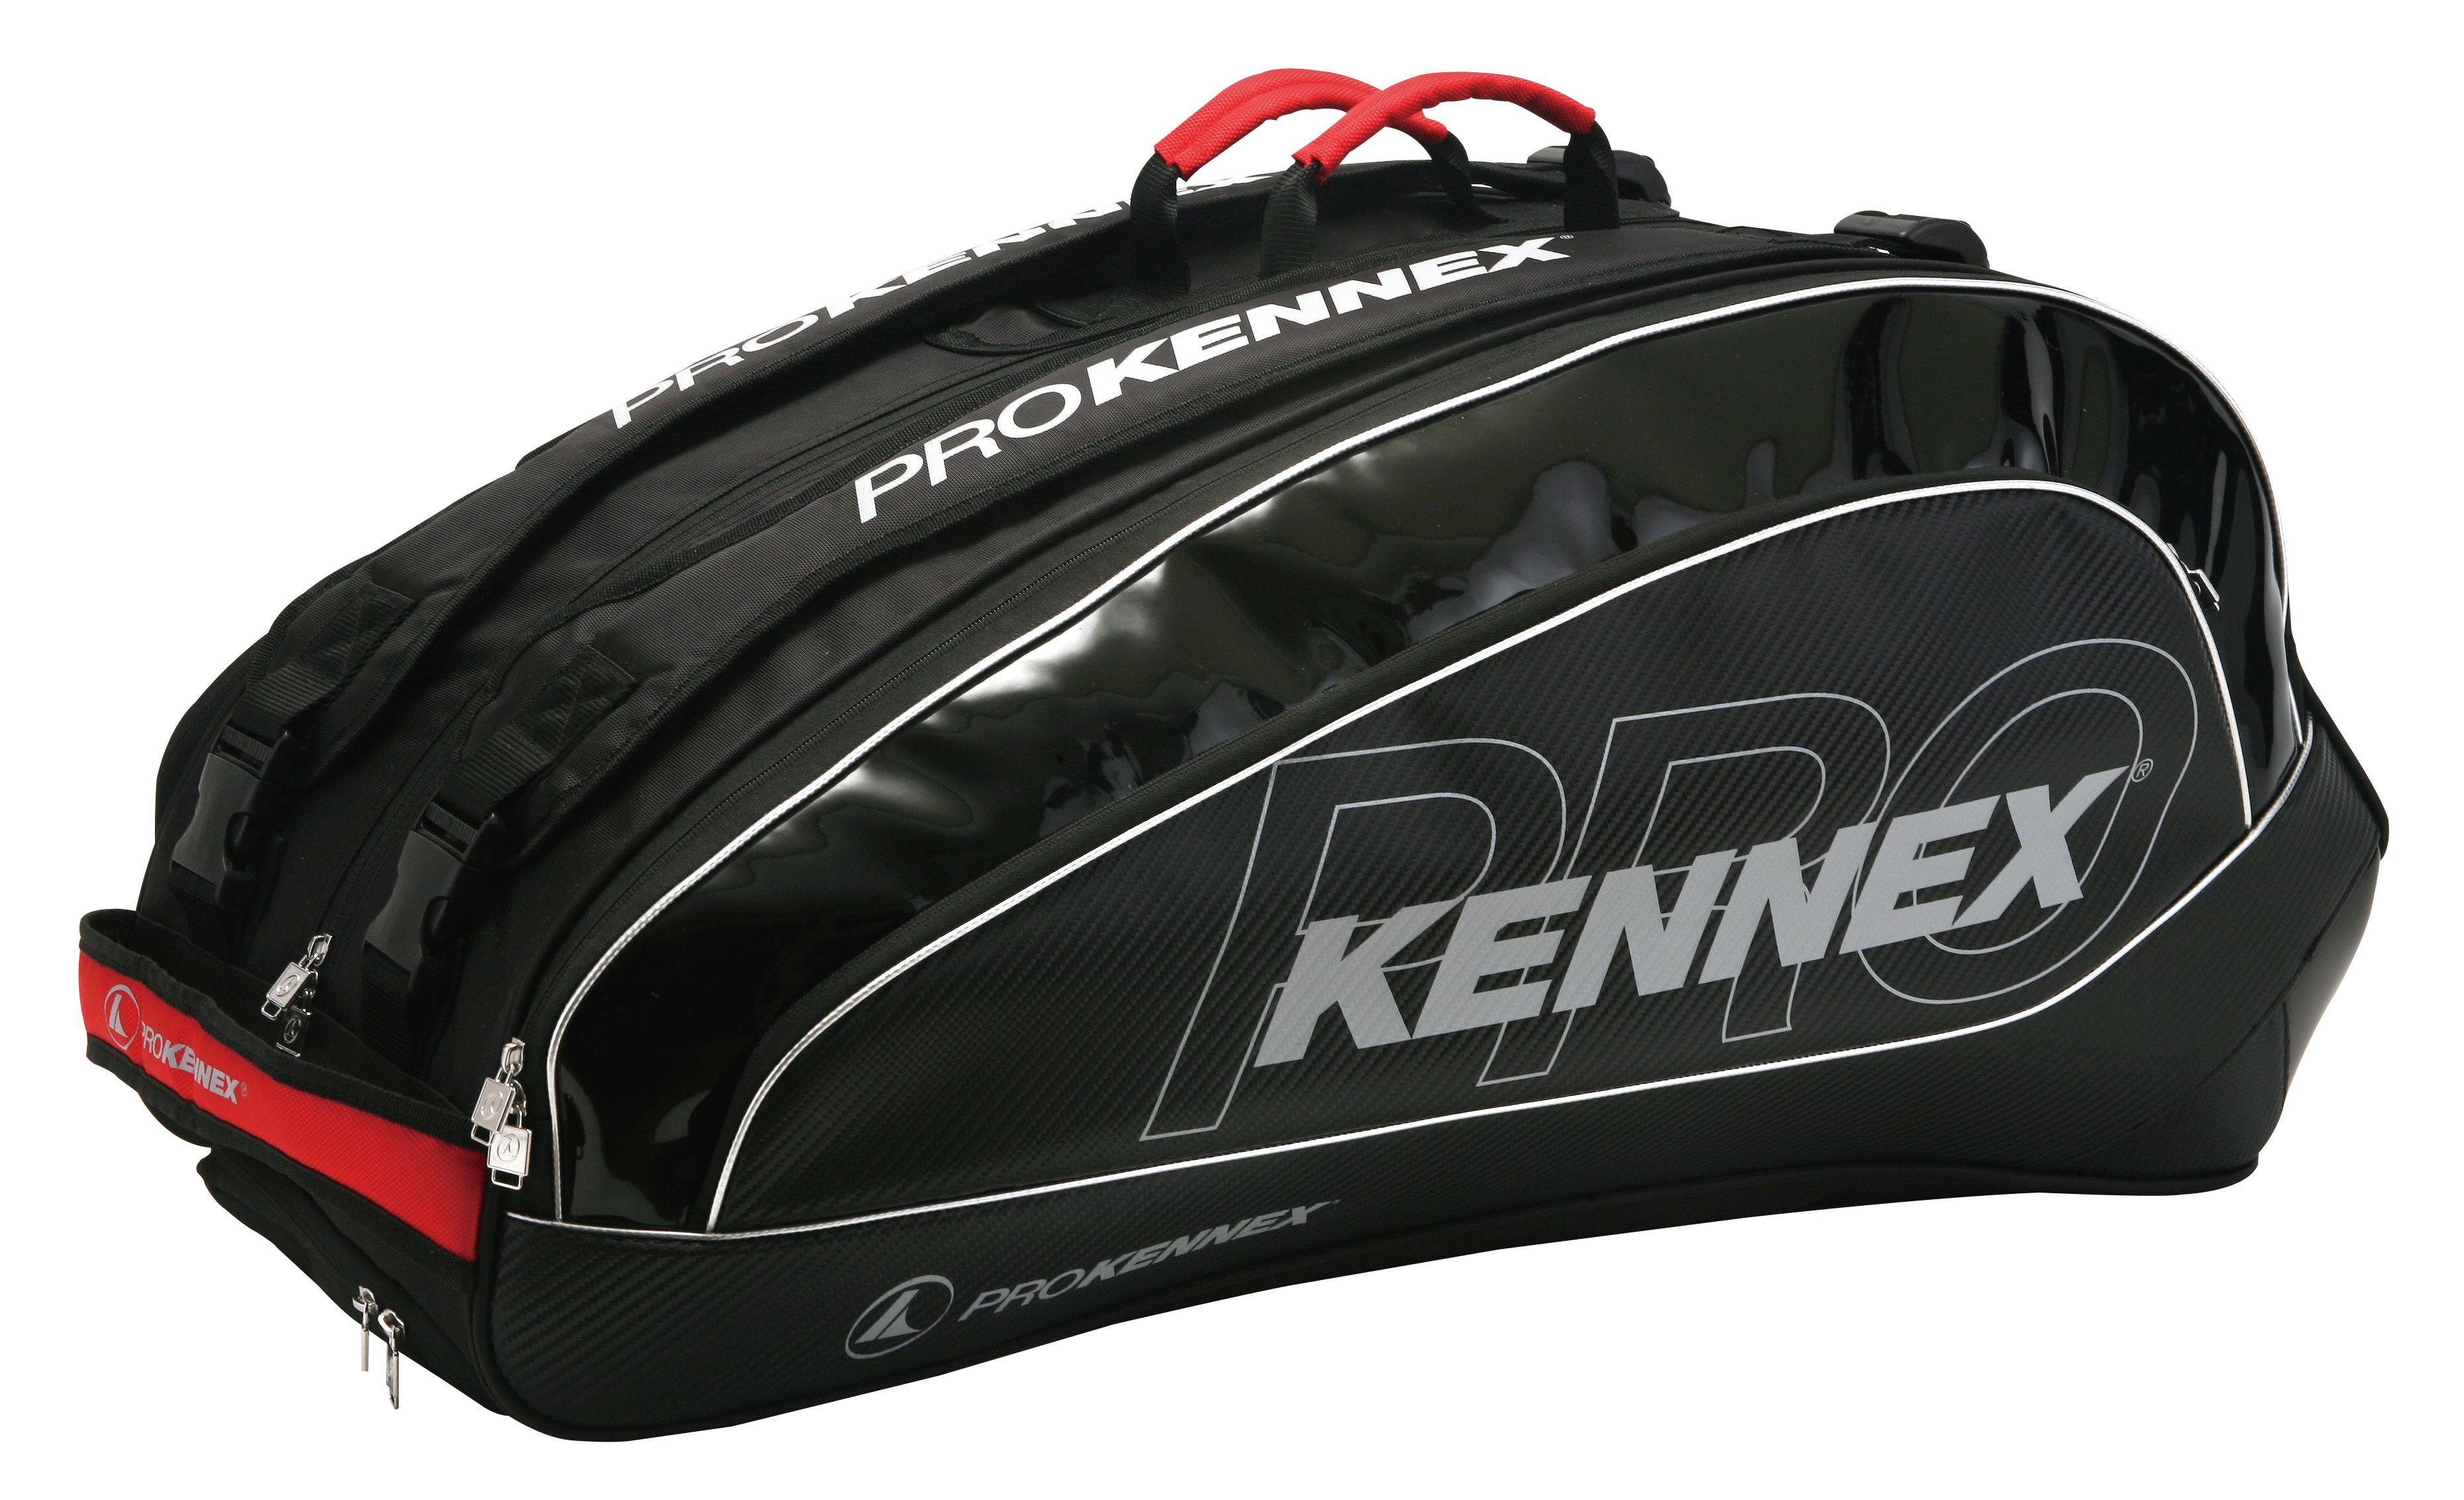 98511d2e95c097 Pro Kennex Triple Bag – Black   Lawler Sports